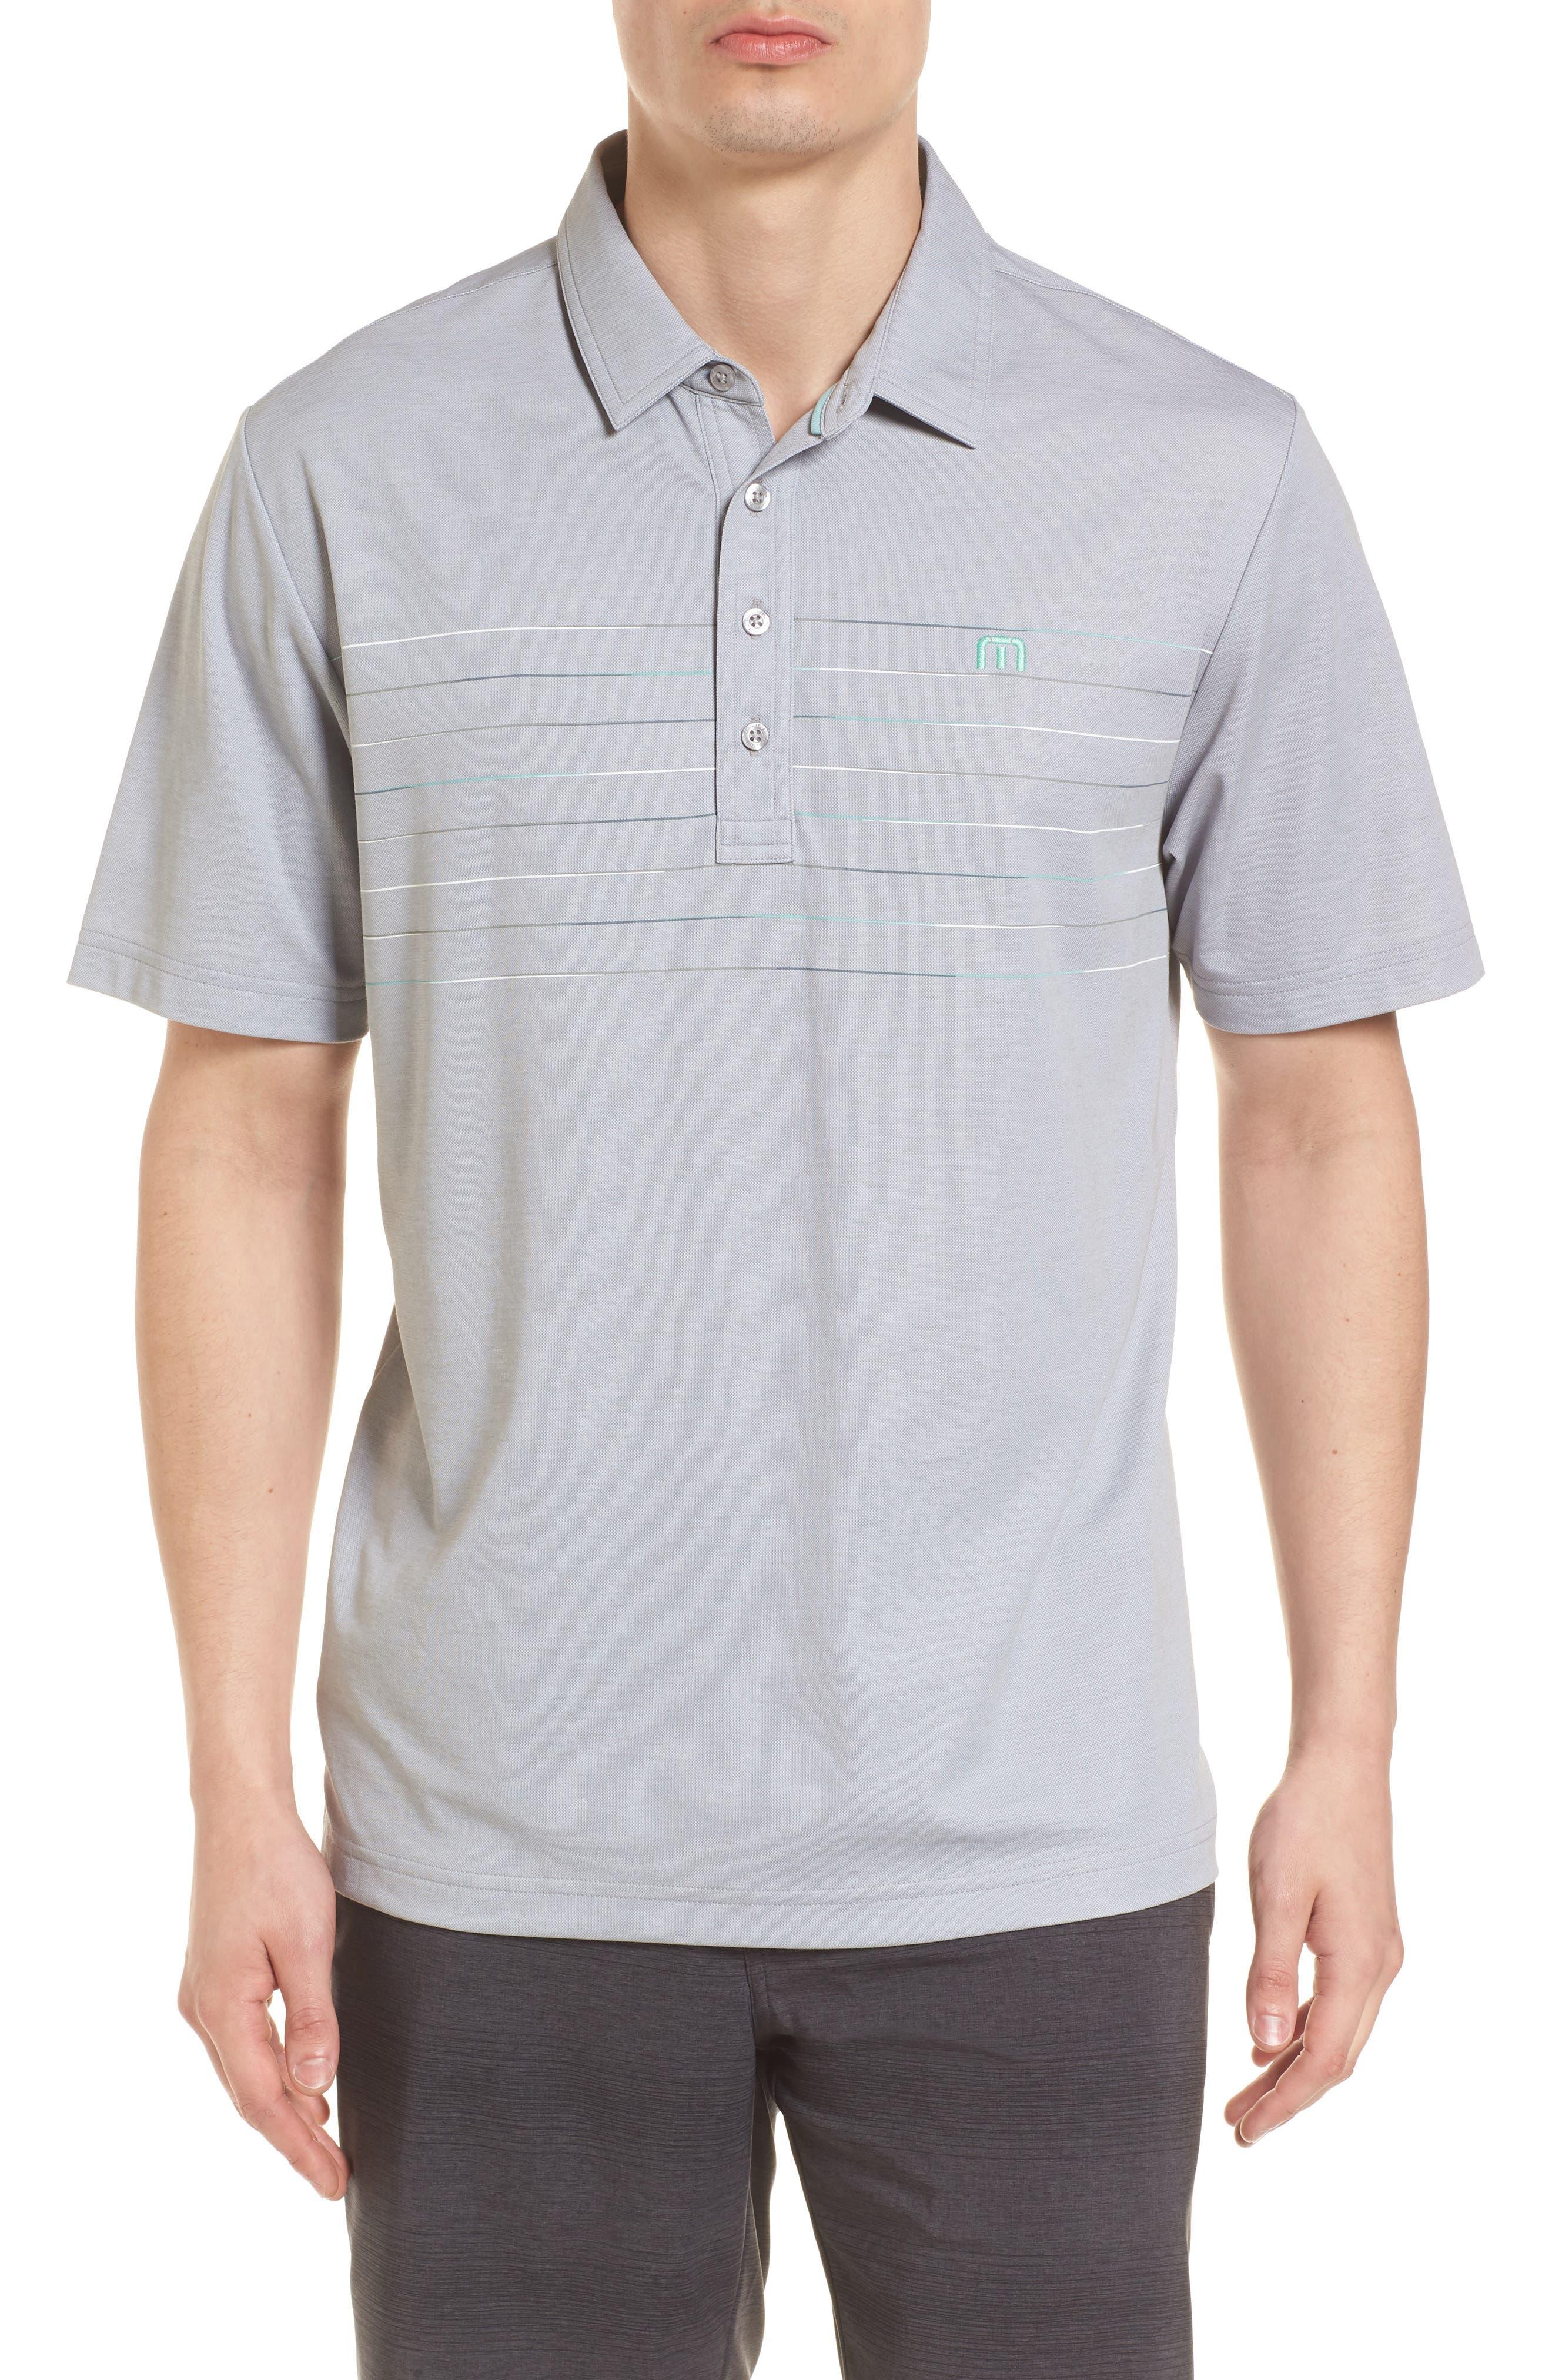 Travis Mathew Good Good Polo Shirt